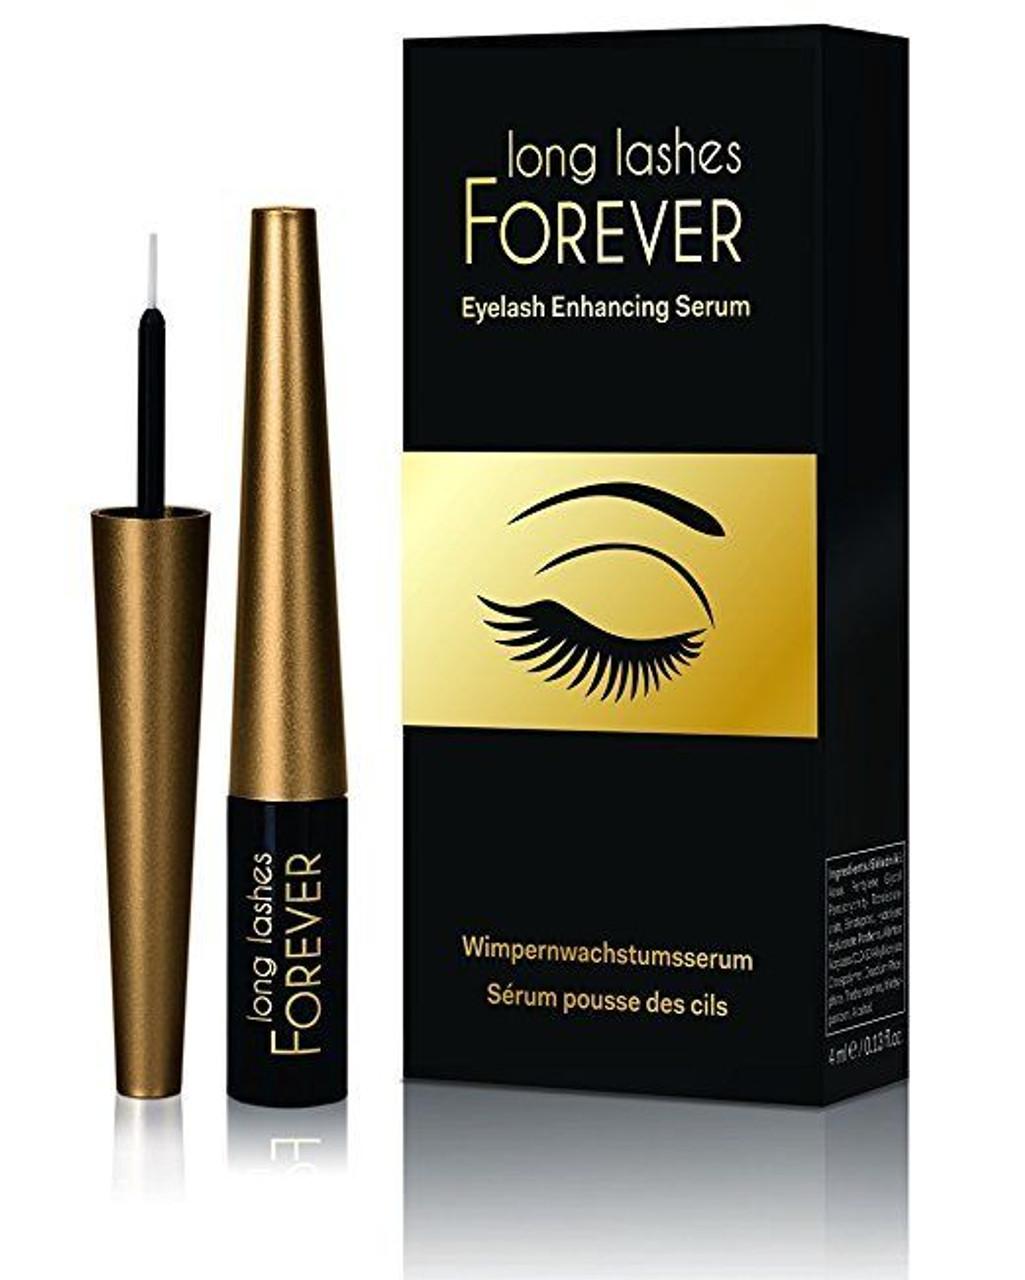 Long Lashes Forever Eyelash Enhancing Serum 4 Ml 1 Ea Nationwide